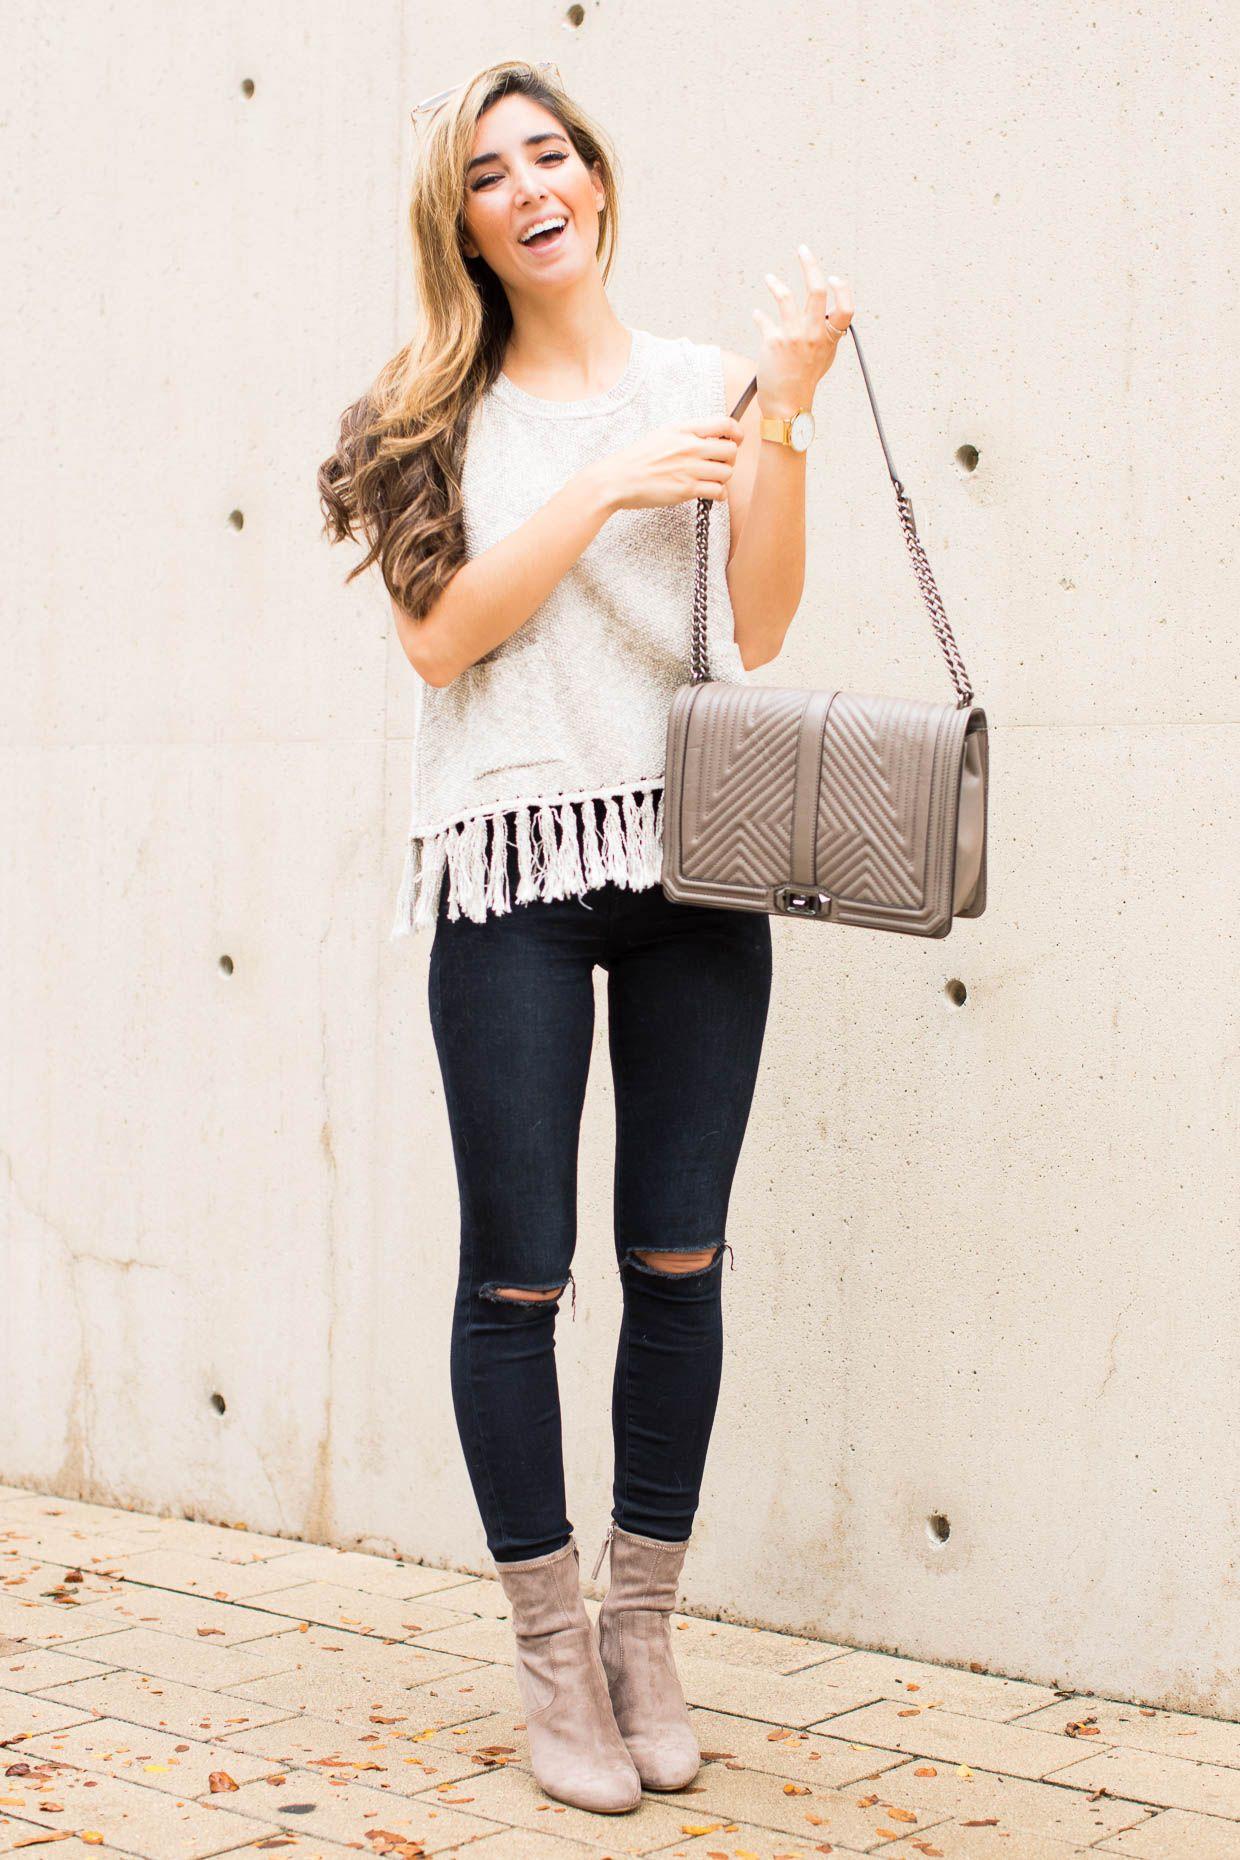 Moviente eso es todo pirámide  Pin by Waysify on Bags | Austin style, Fashion blogger, Fashion